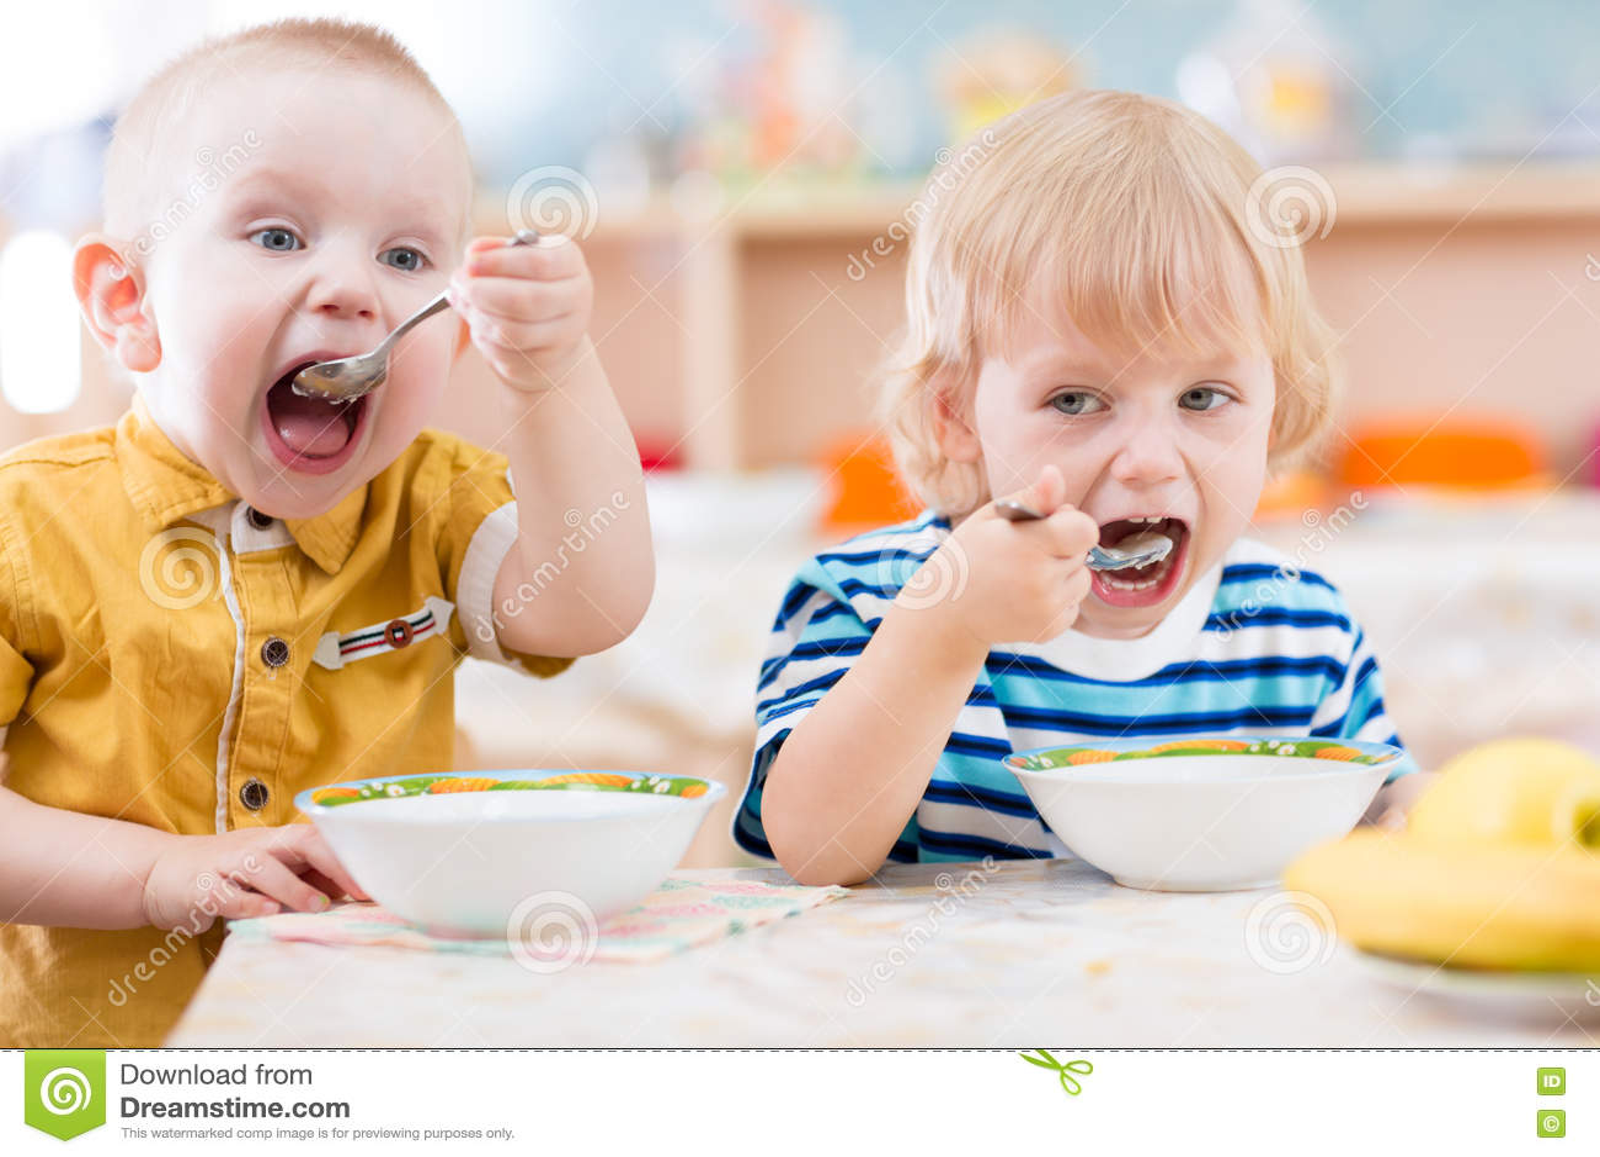 funny little kids - photo #32